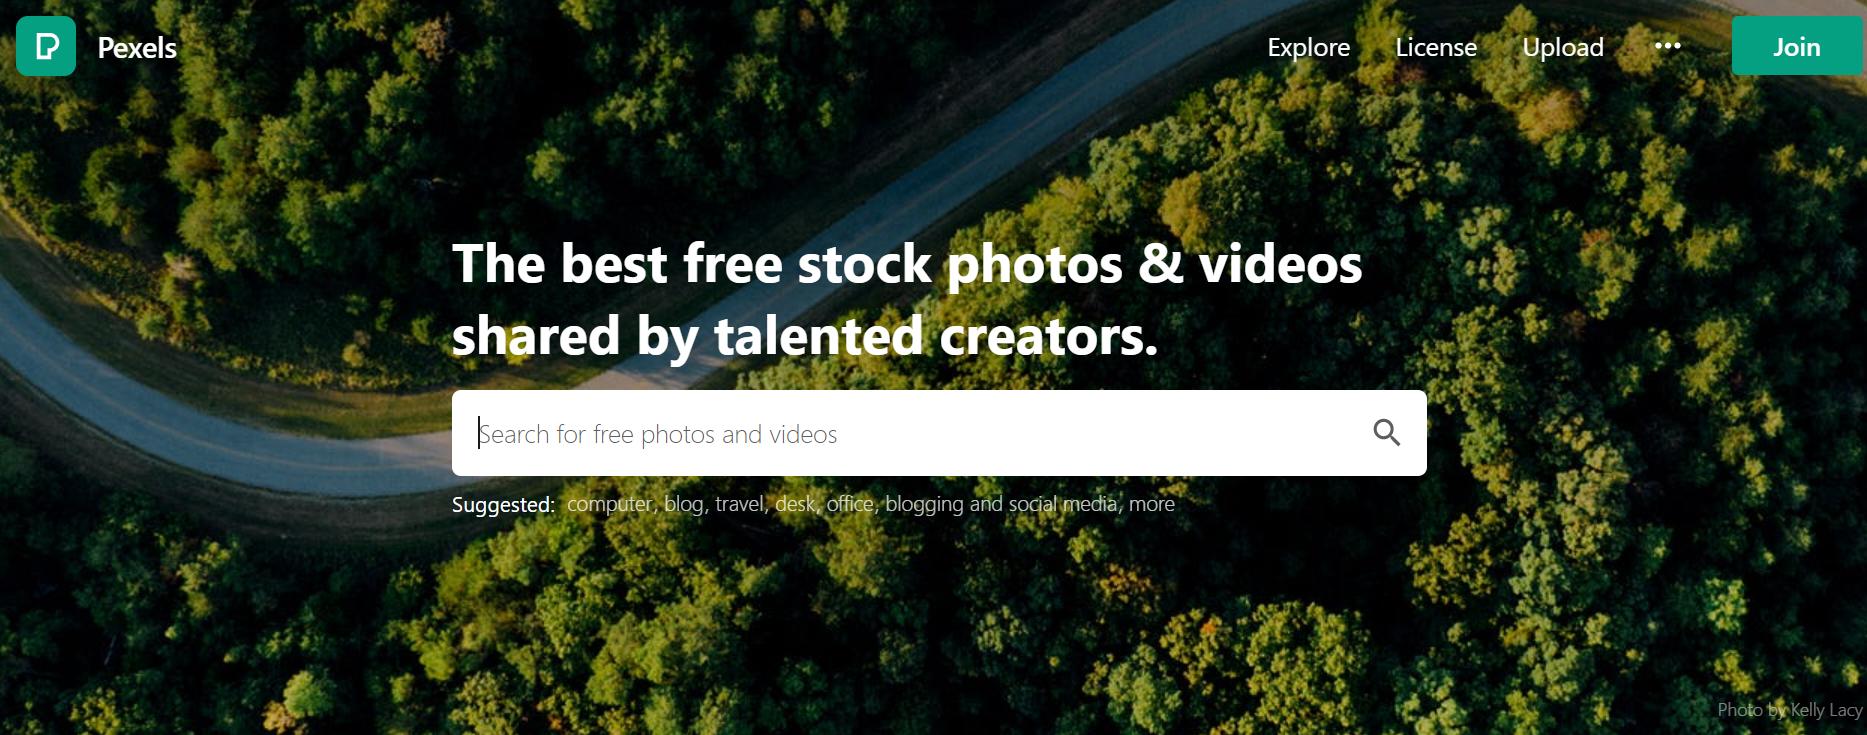 Pexels.com blogging tool for newbie cannabis writers homepage screenshot.